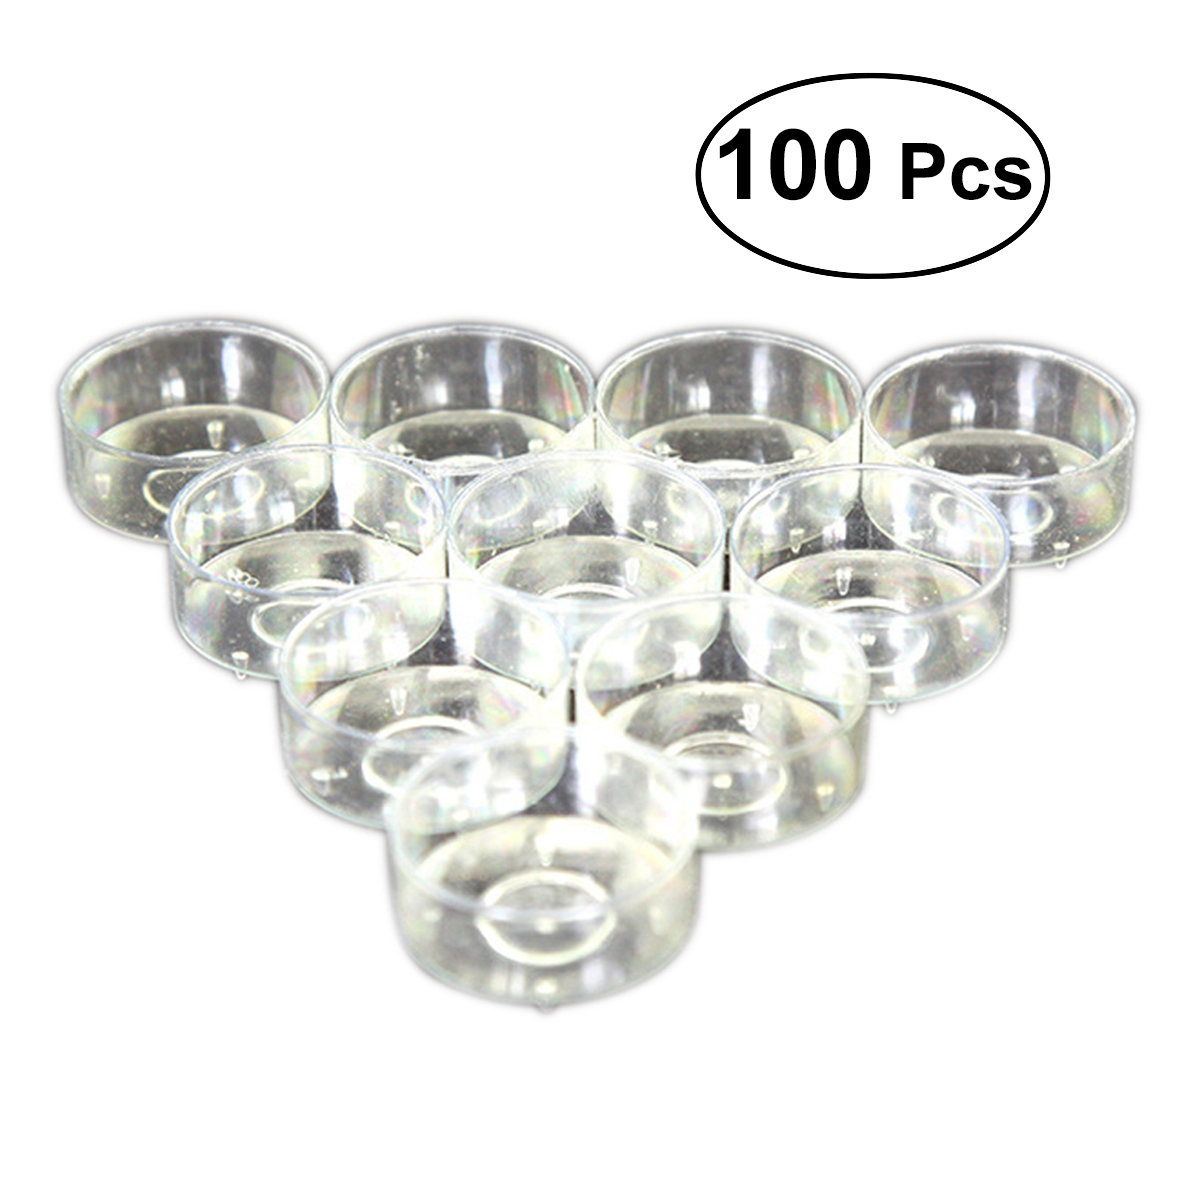 10x Clear Butterfly Tealight Cup Tea Light Holder Candle Molds Wedding Decor